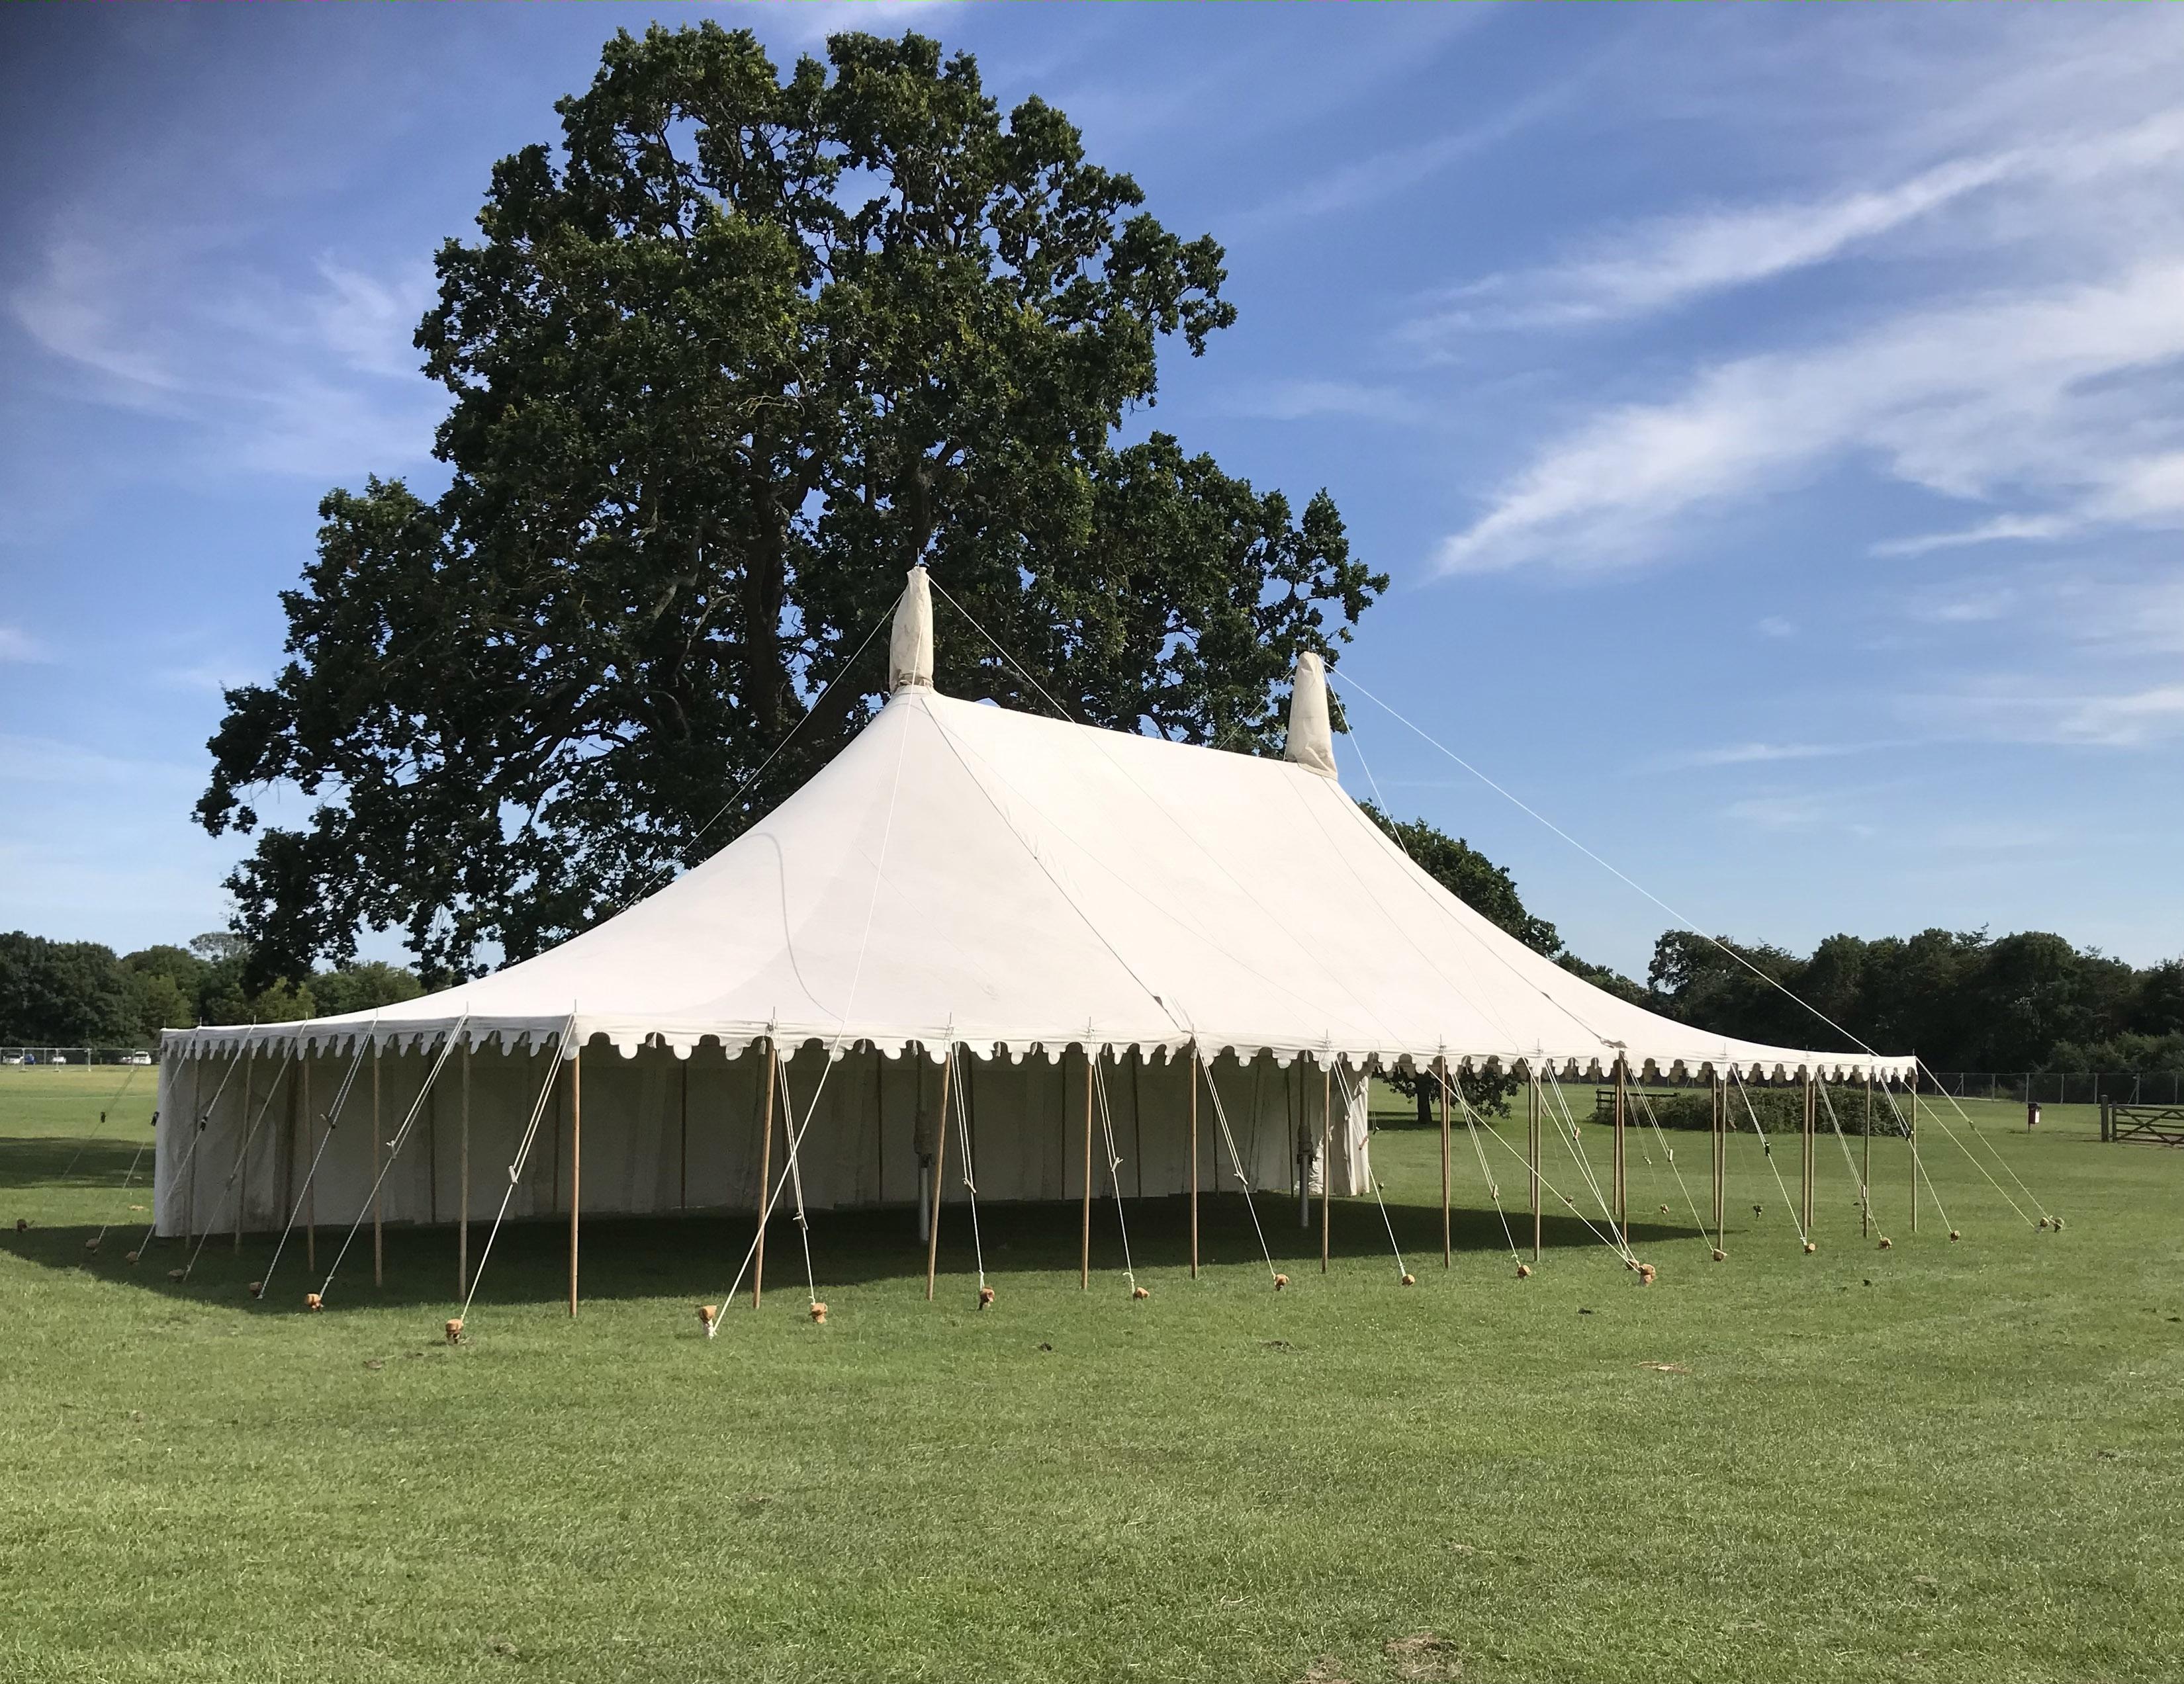 The Chaaya Tent 2